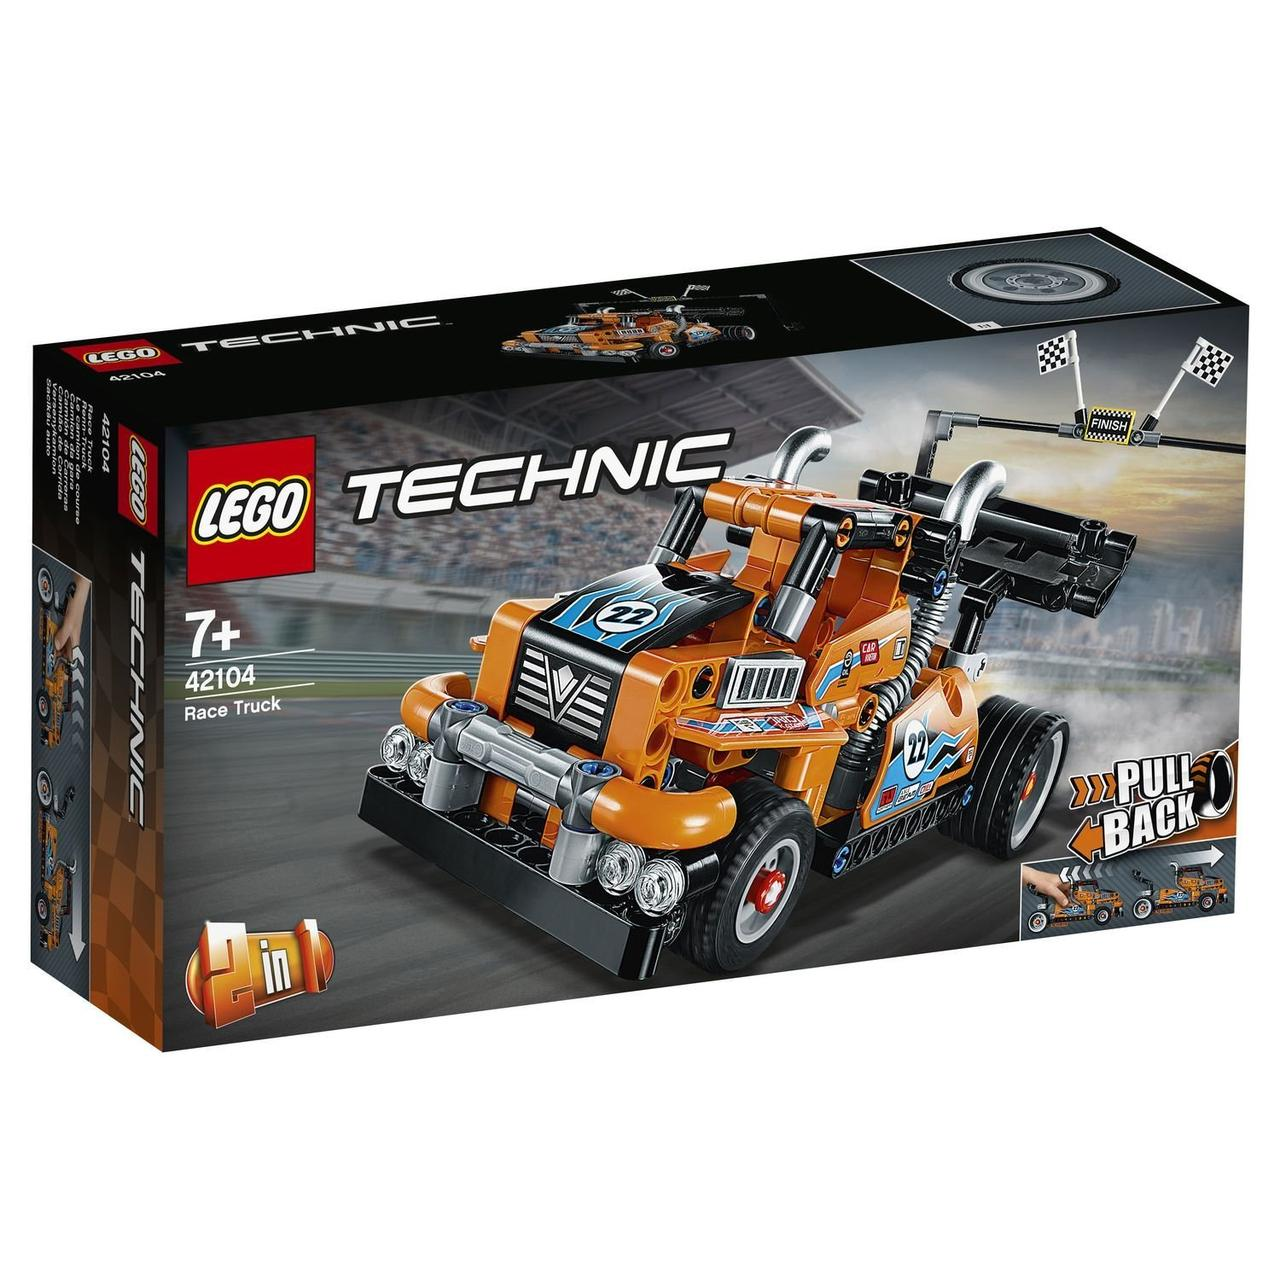 42104 Lego Technic Гоночный грузовик, Лего Техник